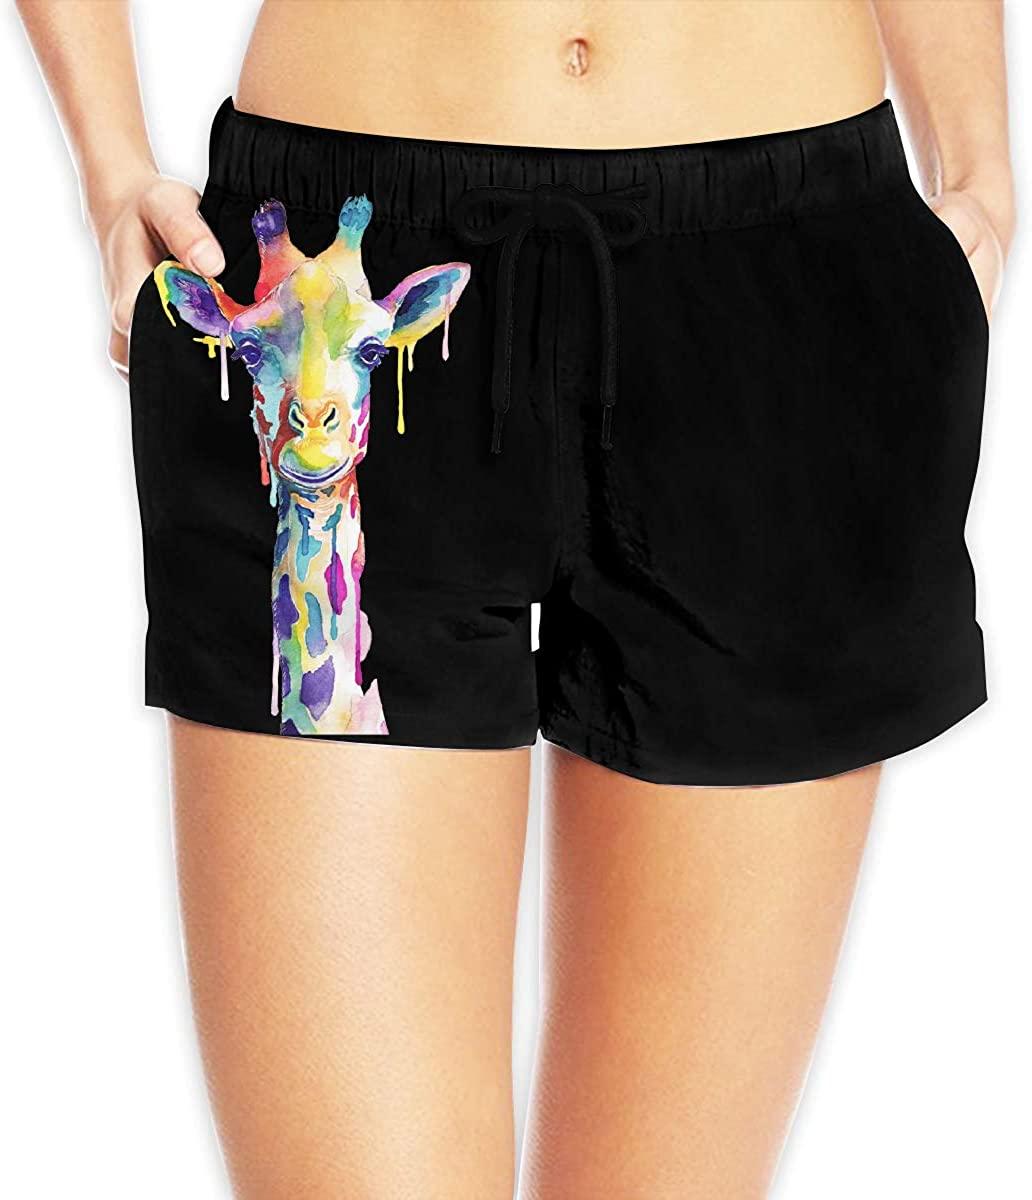 LzVong Watercolor Giraffe Women's Female Beach Pants Summer Beachwear Board Shorts